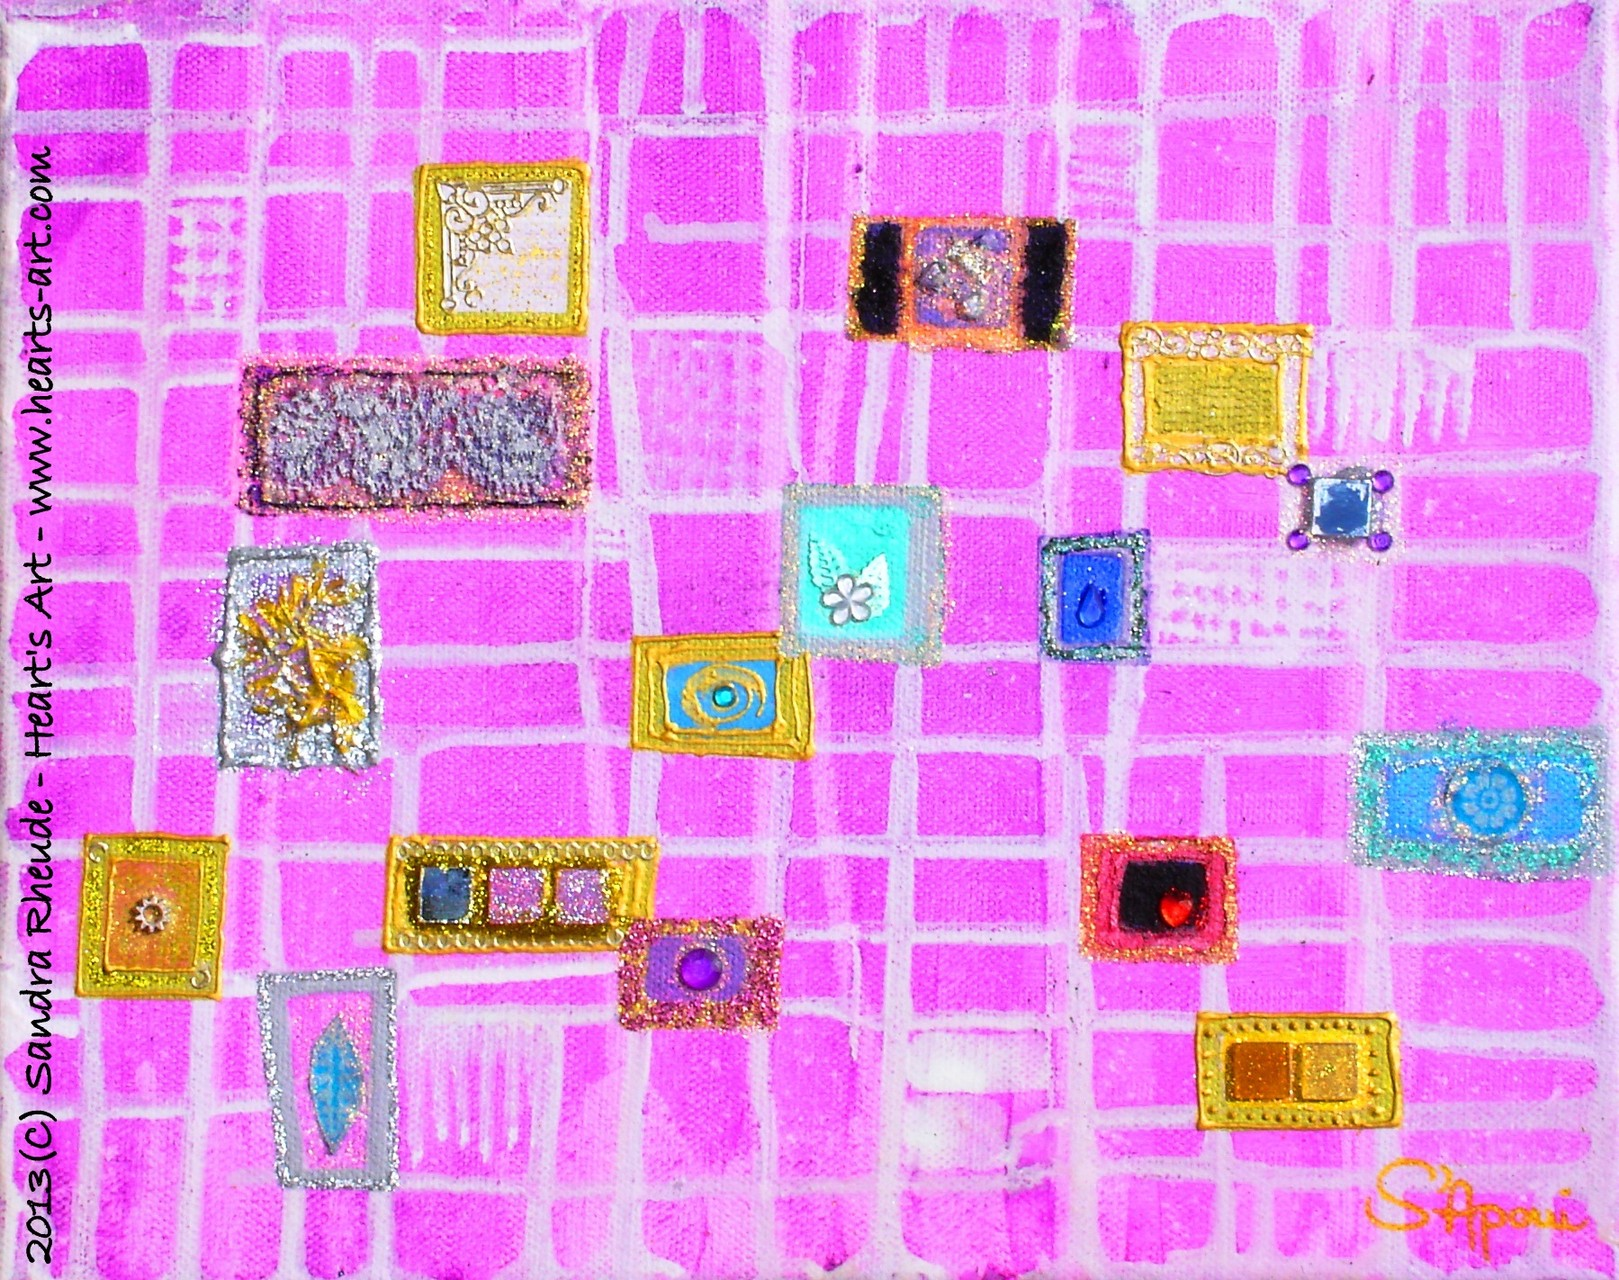 'Seelenfenster' - 2013/57 - Acryl/MixedMedia auf Leinwand - 30 x 24 cm - € 130